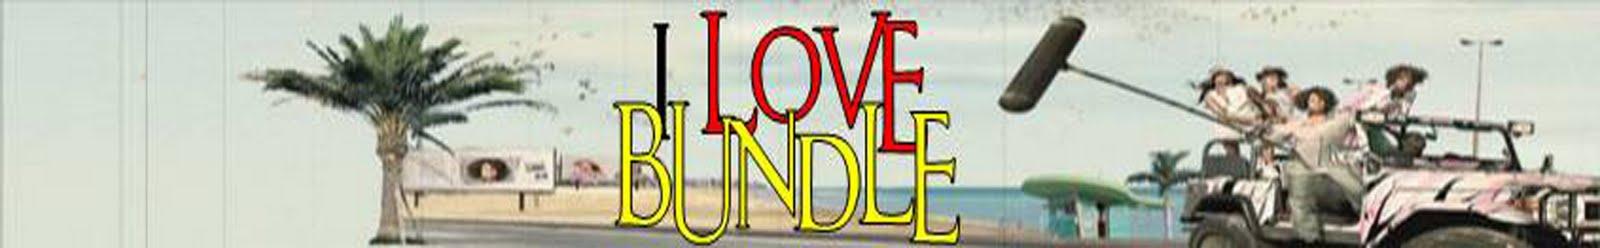 I LOVE BUNDLE